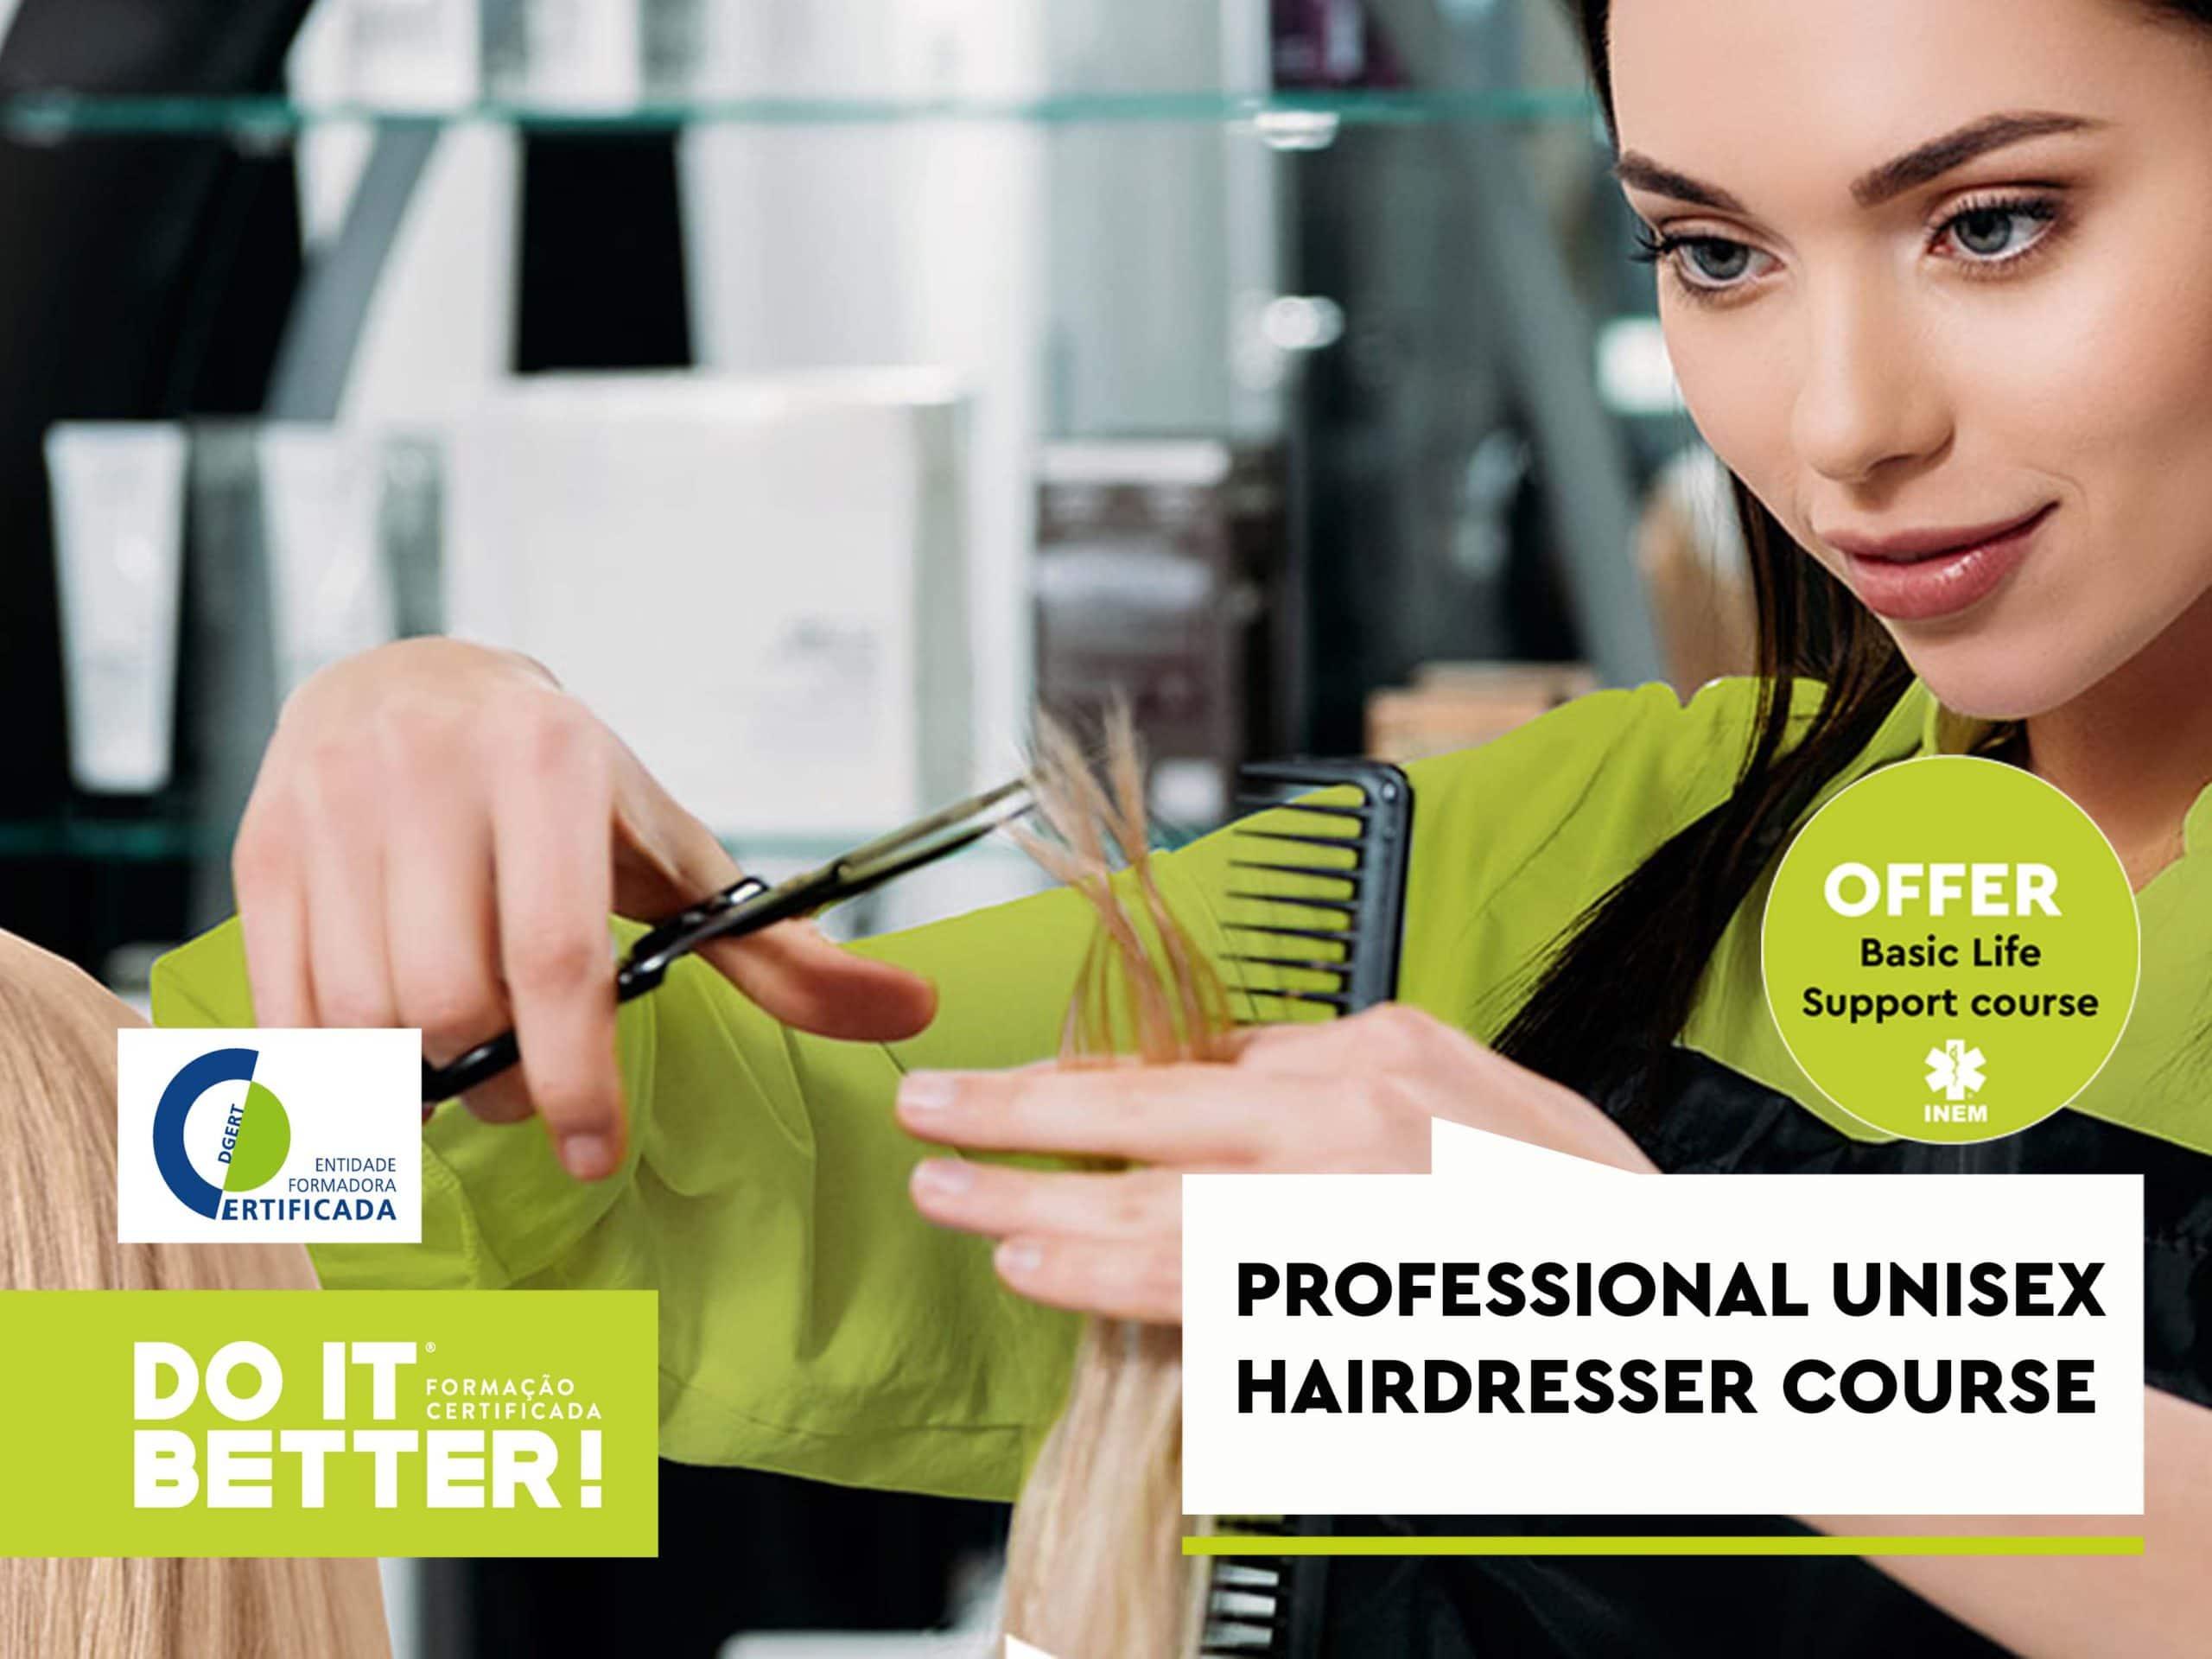 Professional Unisex Hairdresser-offer